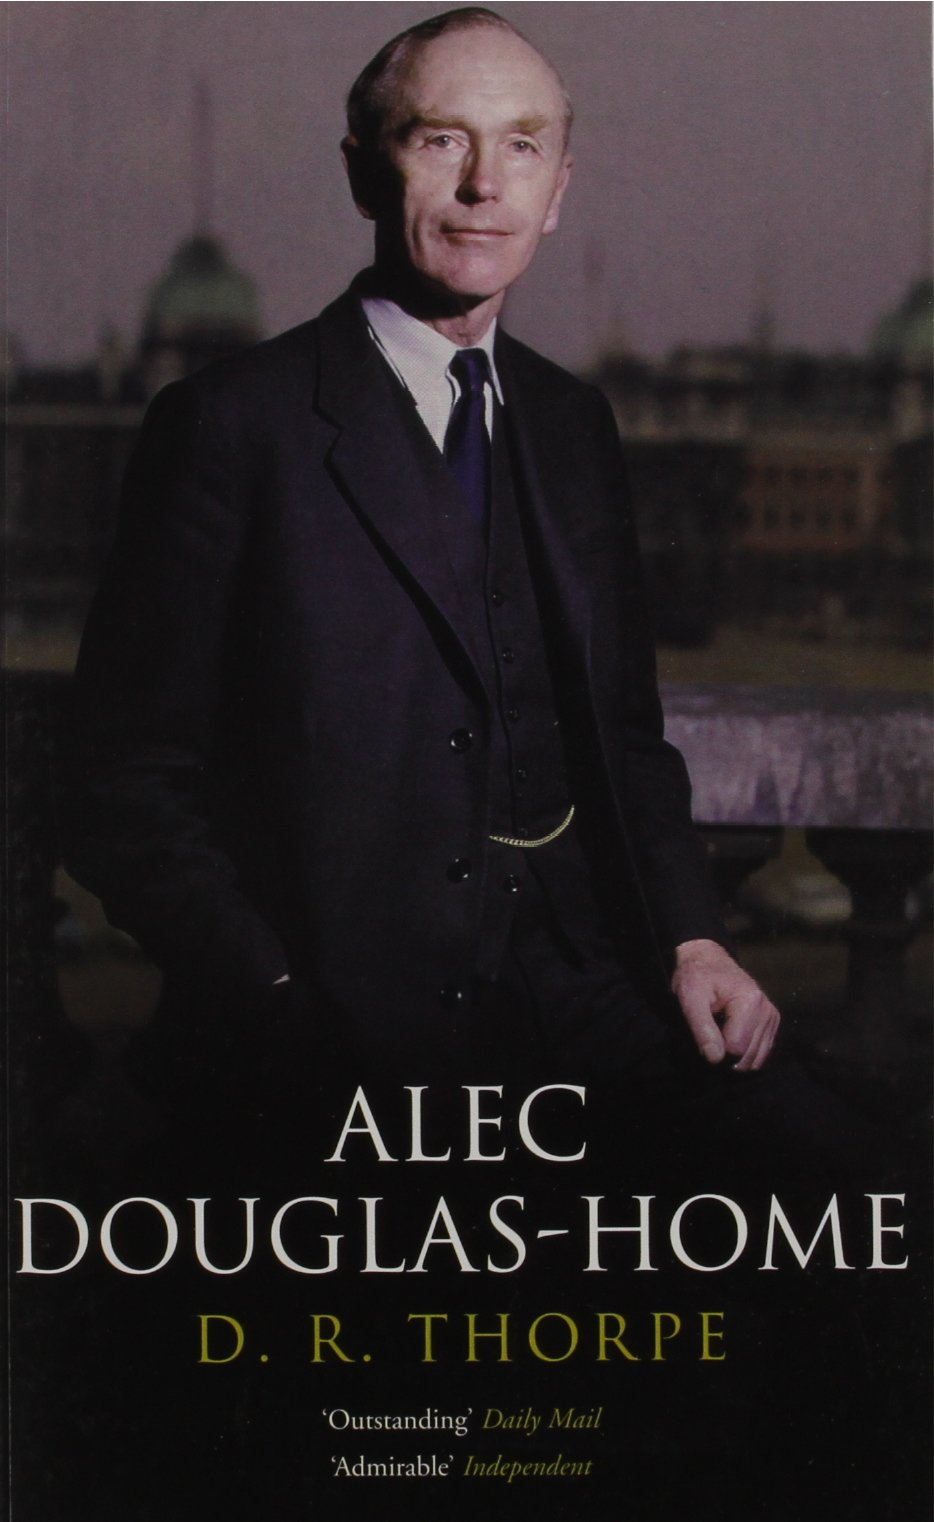 Alec Douglas-Home